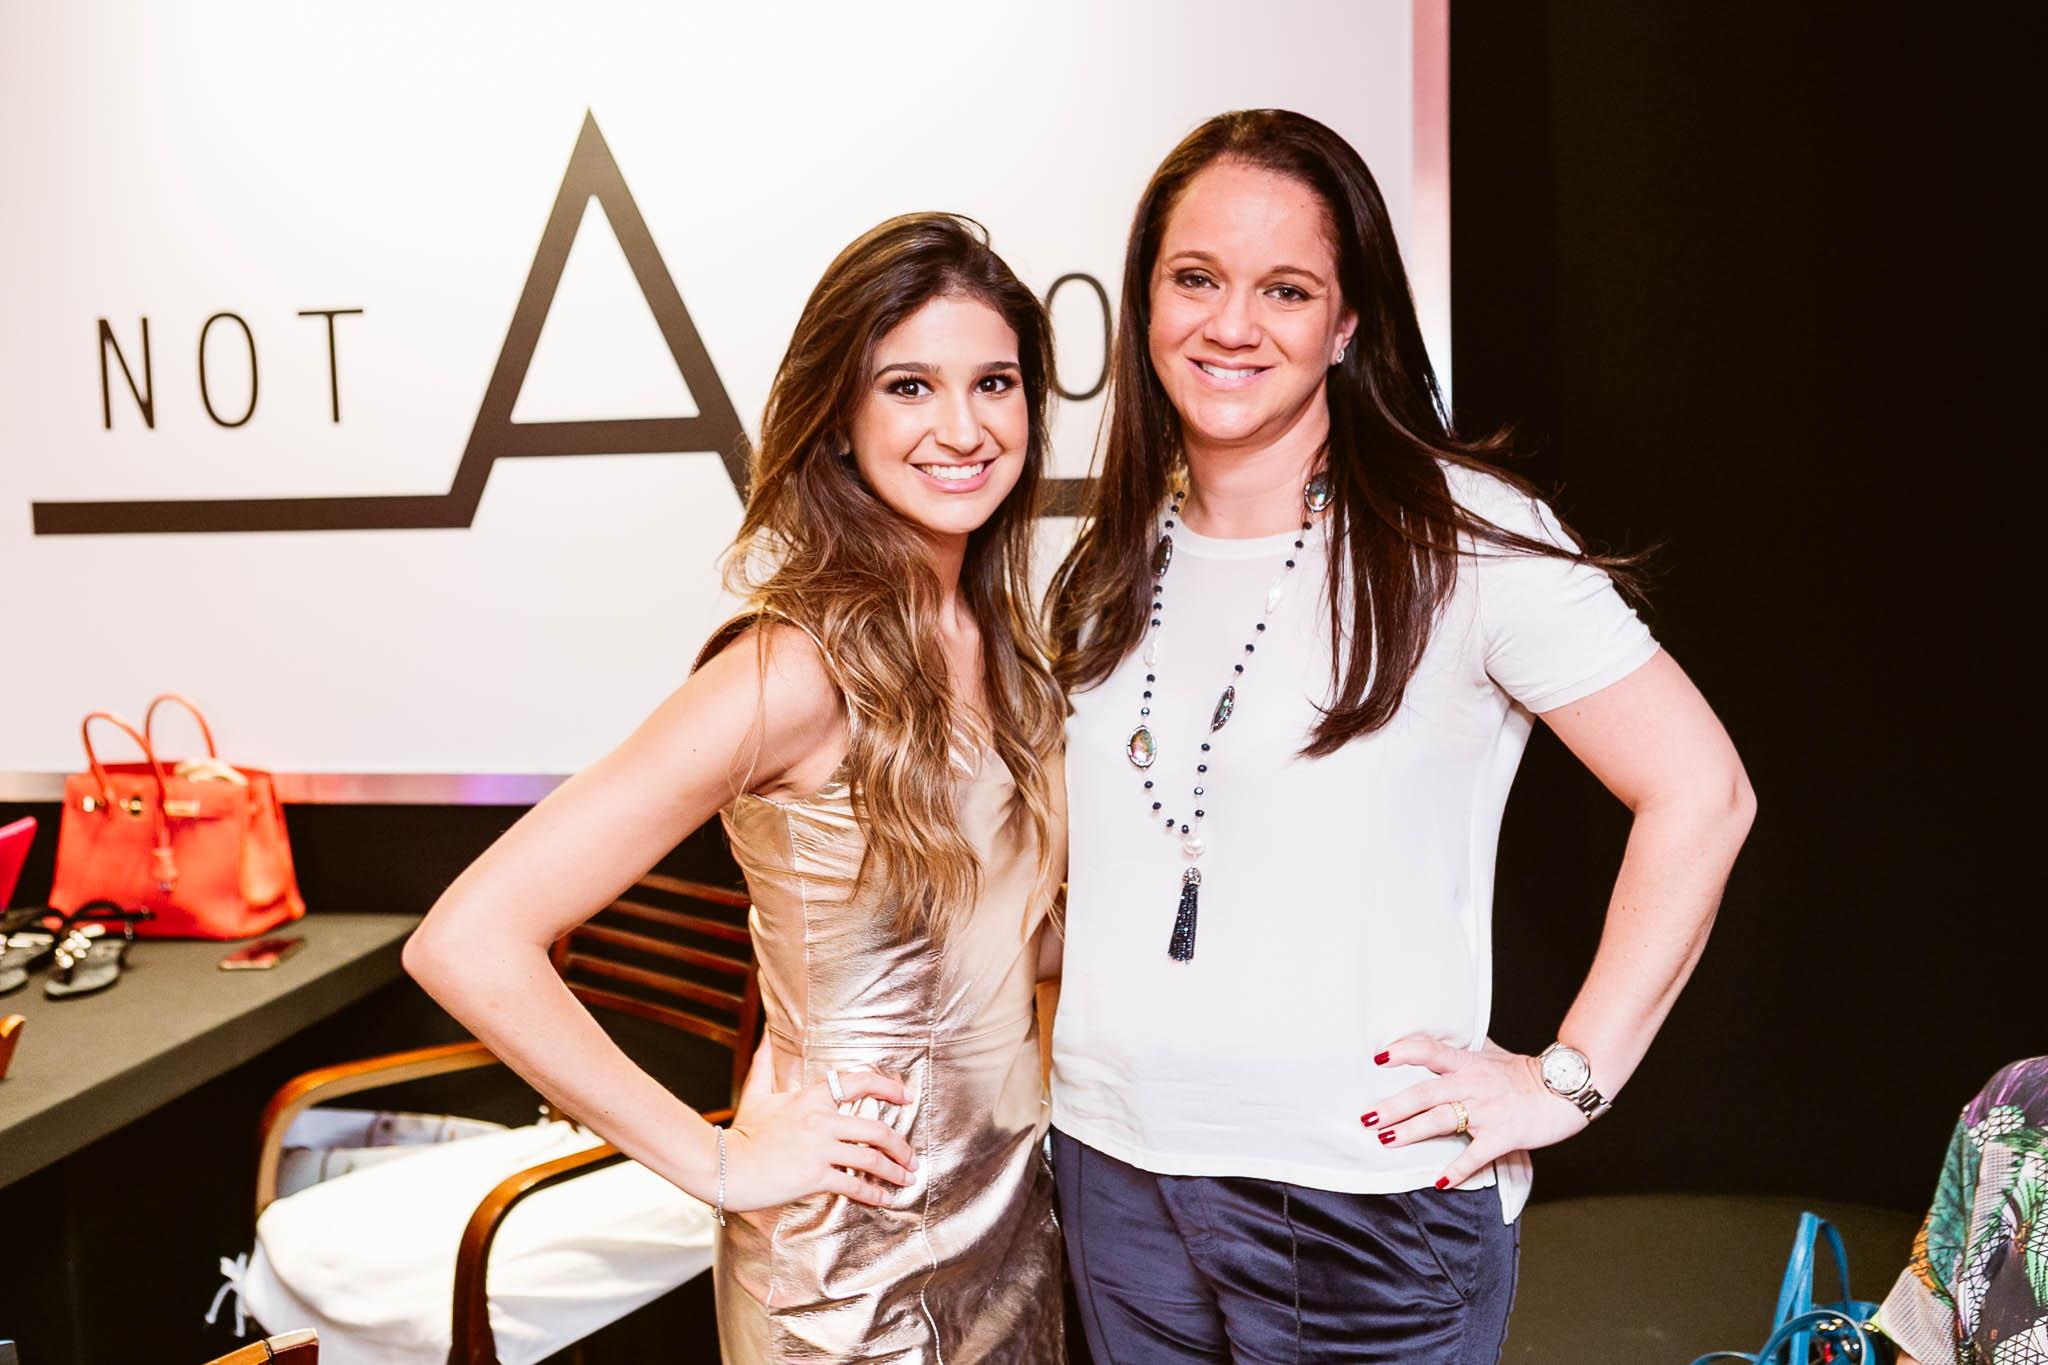 Ana Gabriela Velloso Lage e Andrea Lage